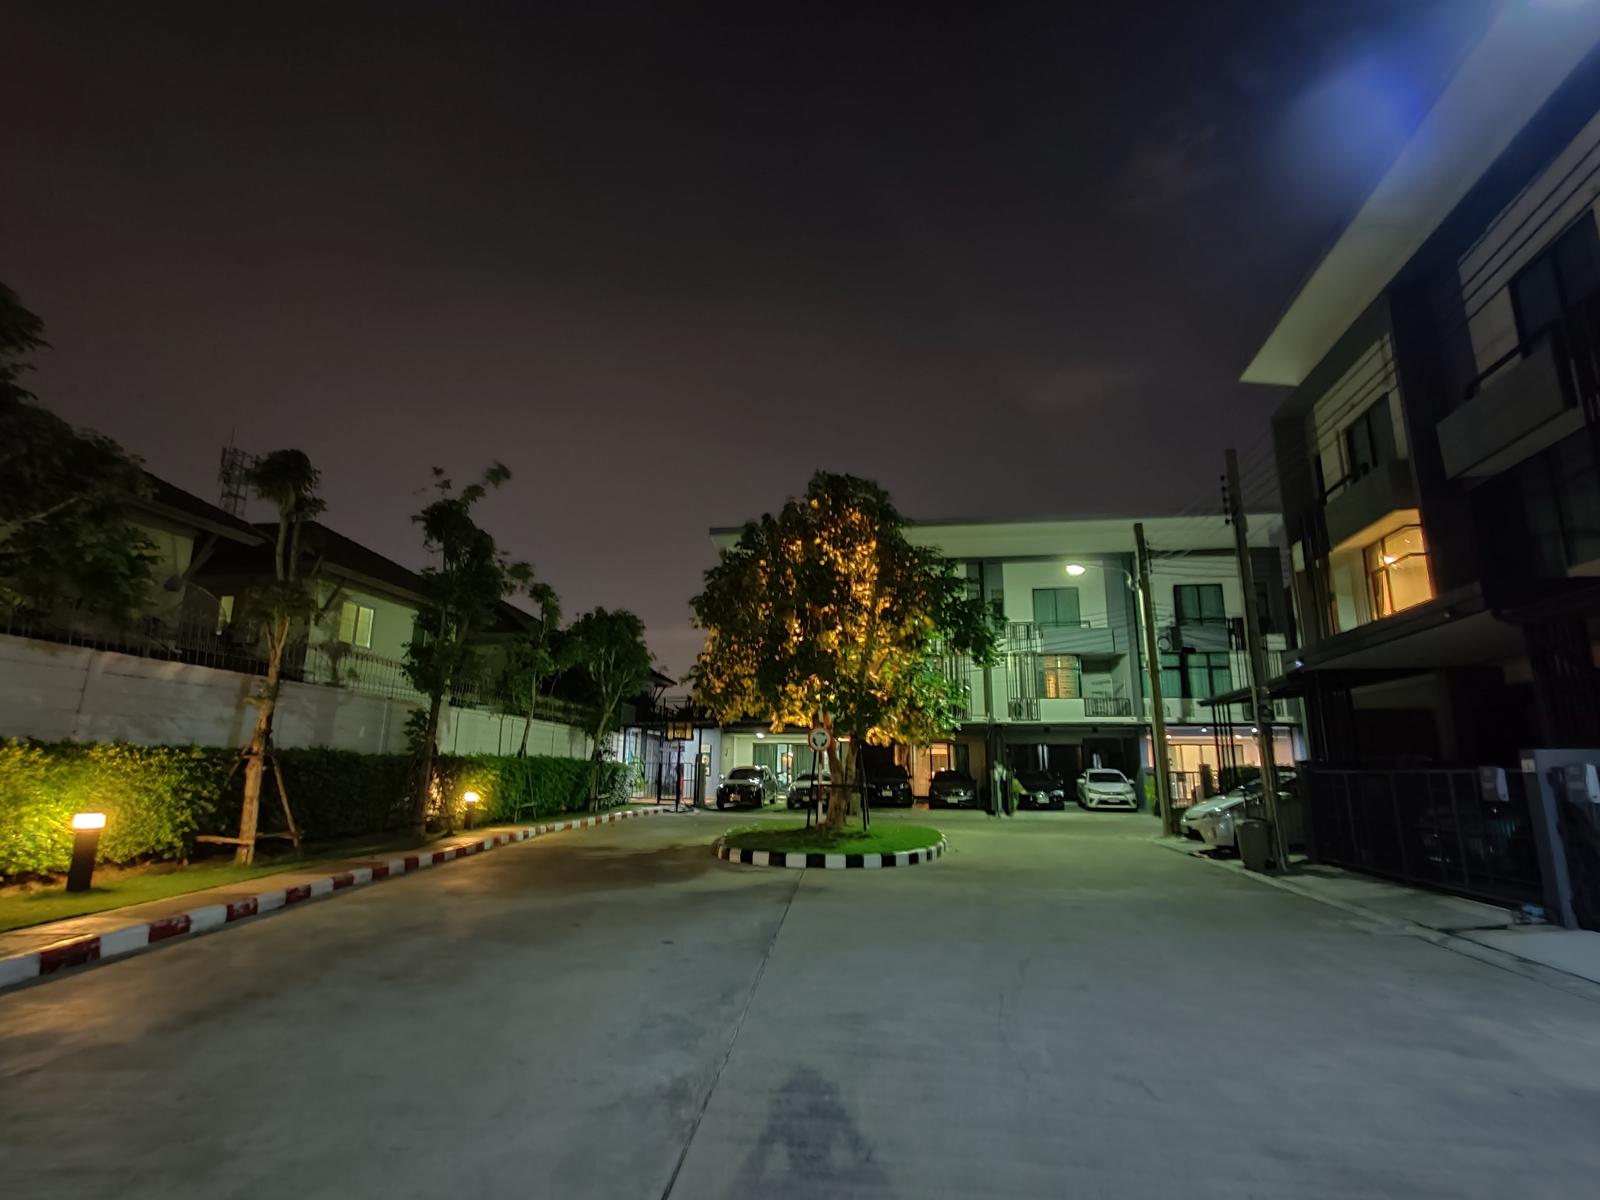 Shot on OnePlus 8 Pro Nightscape 3.0